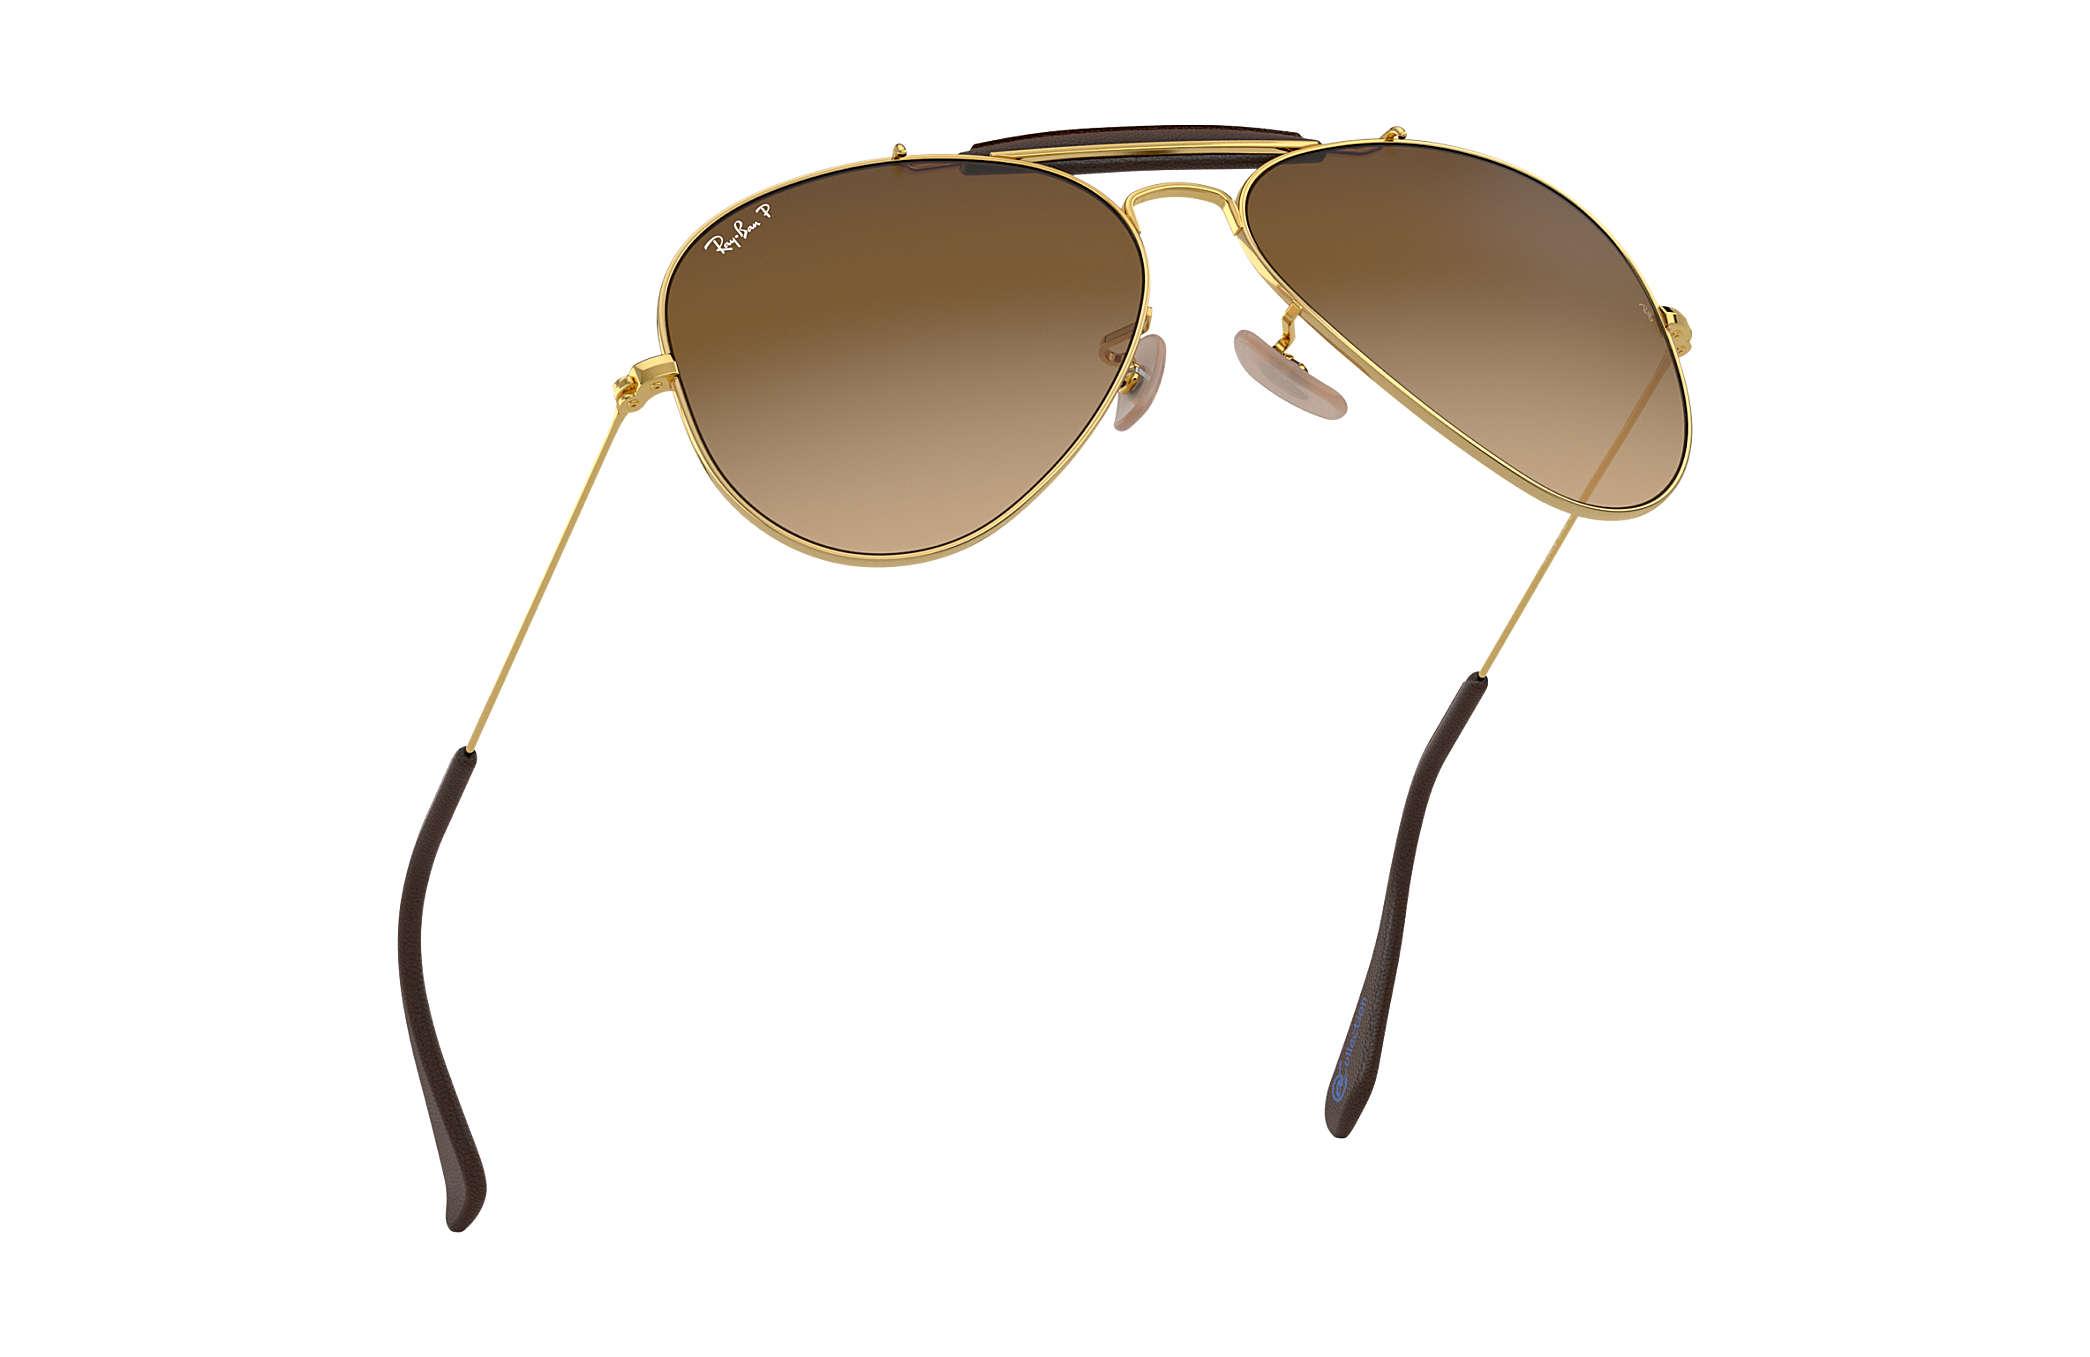 65b37dddd832c7 ... buy ray ban 0rb3422q outdoorsman craft collection gold sun 5cfed 99cb8